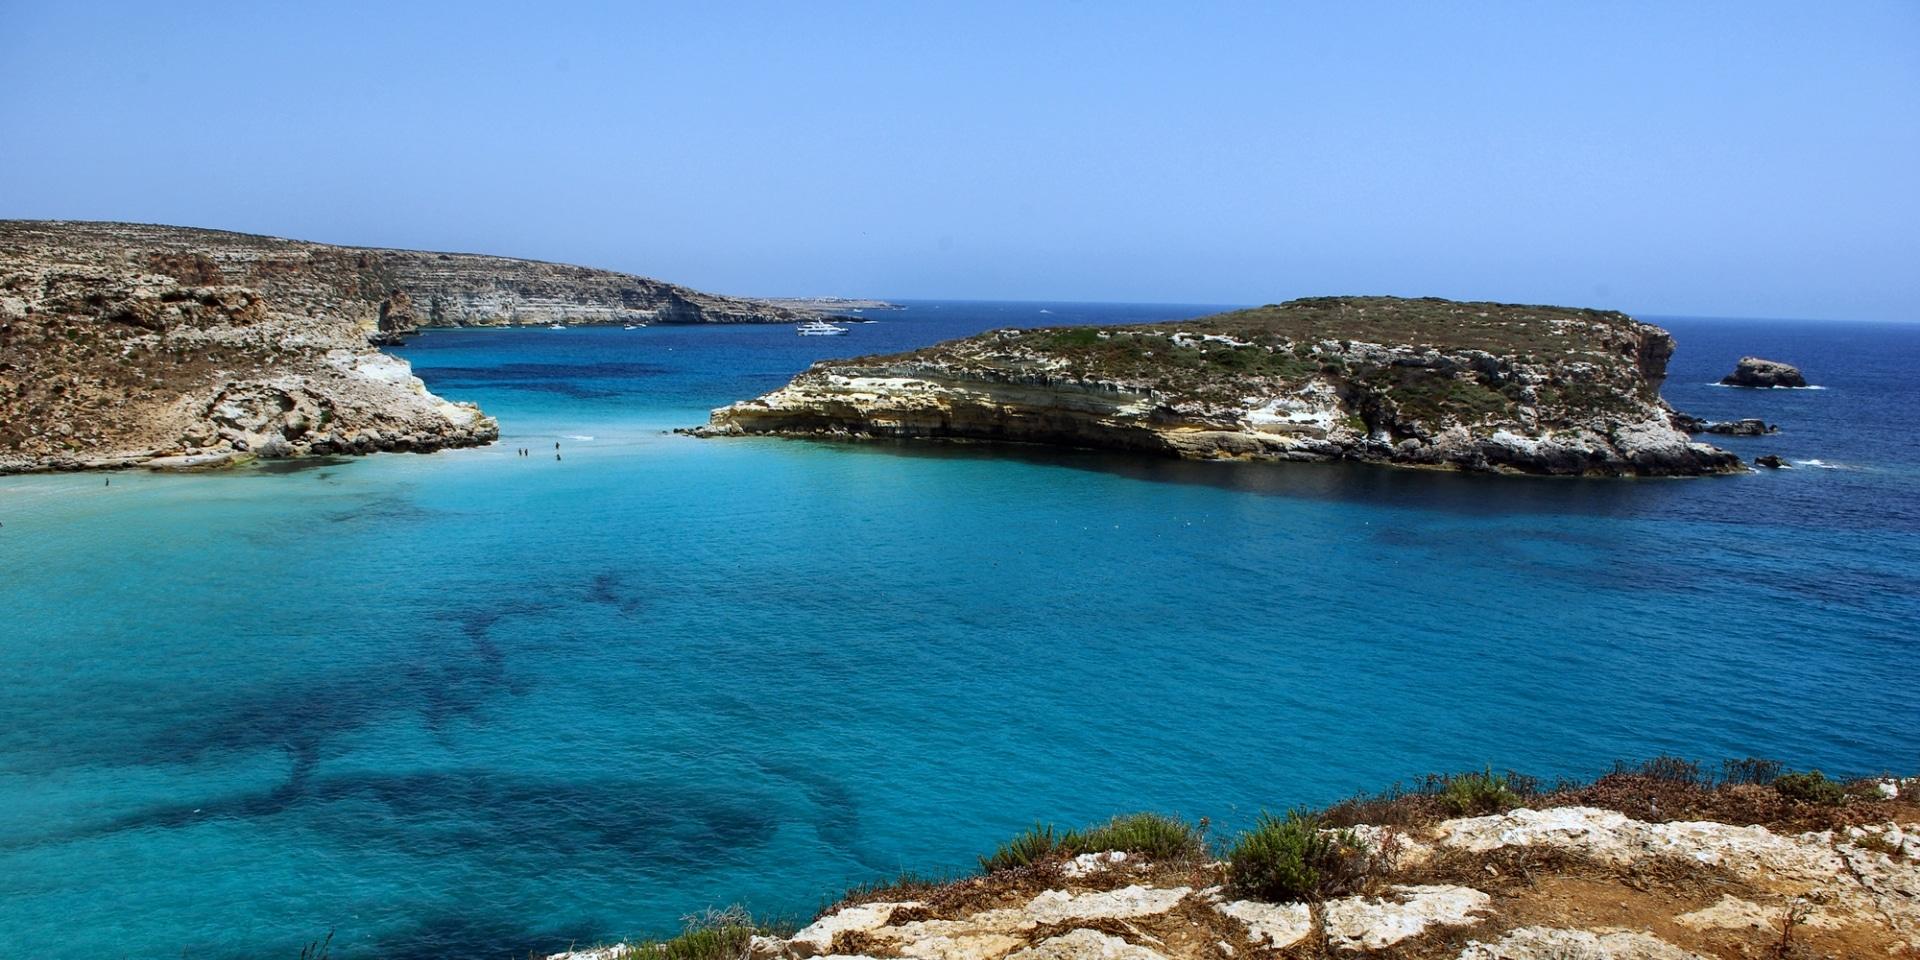 Vacanze diving a Lampedusa - Viaggi per sub